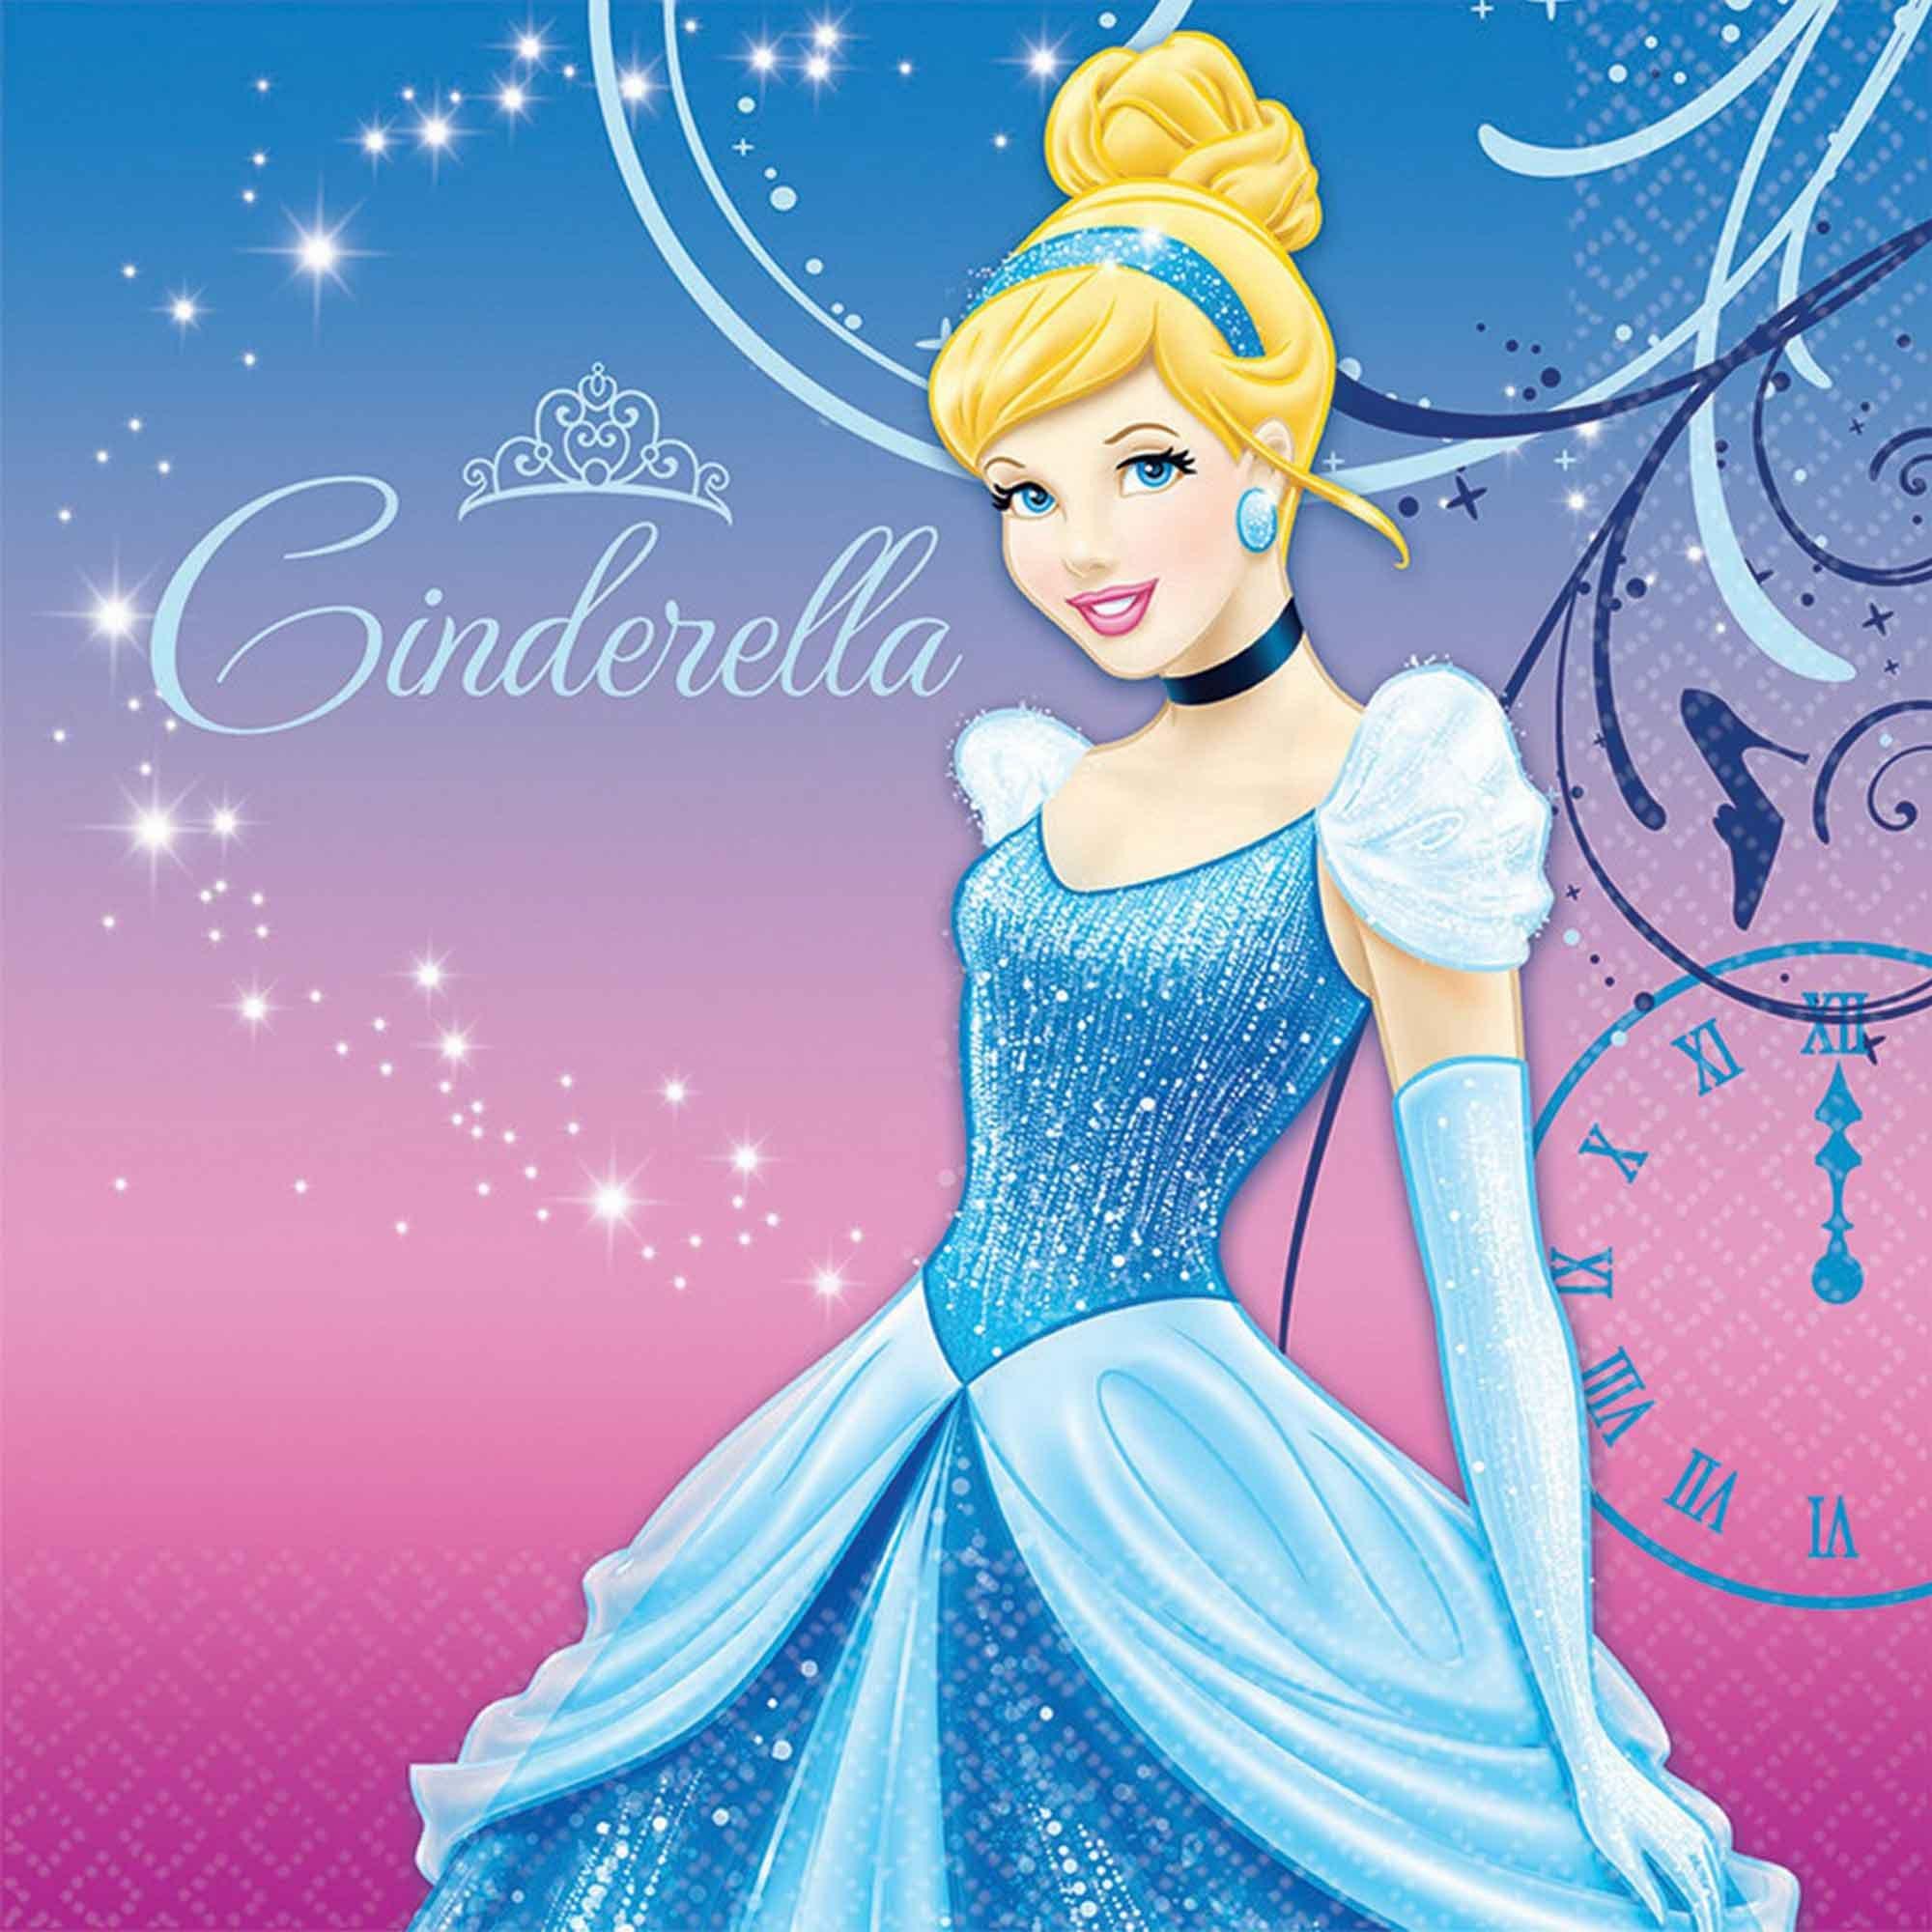 Cinderella Lunch Napkins